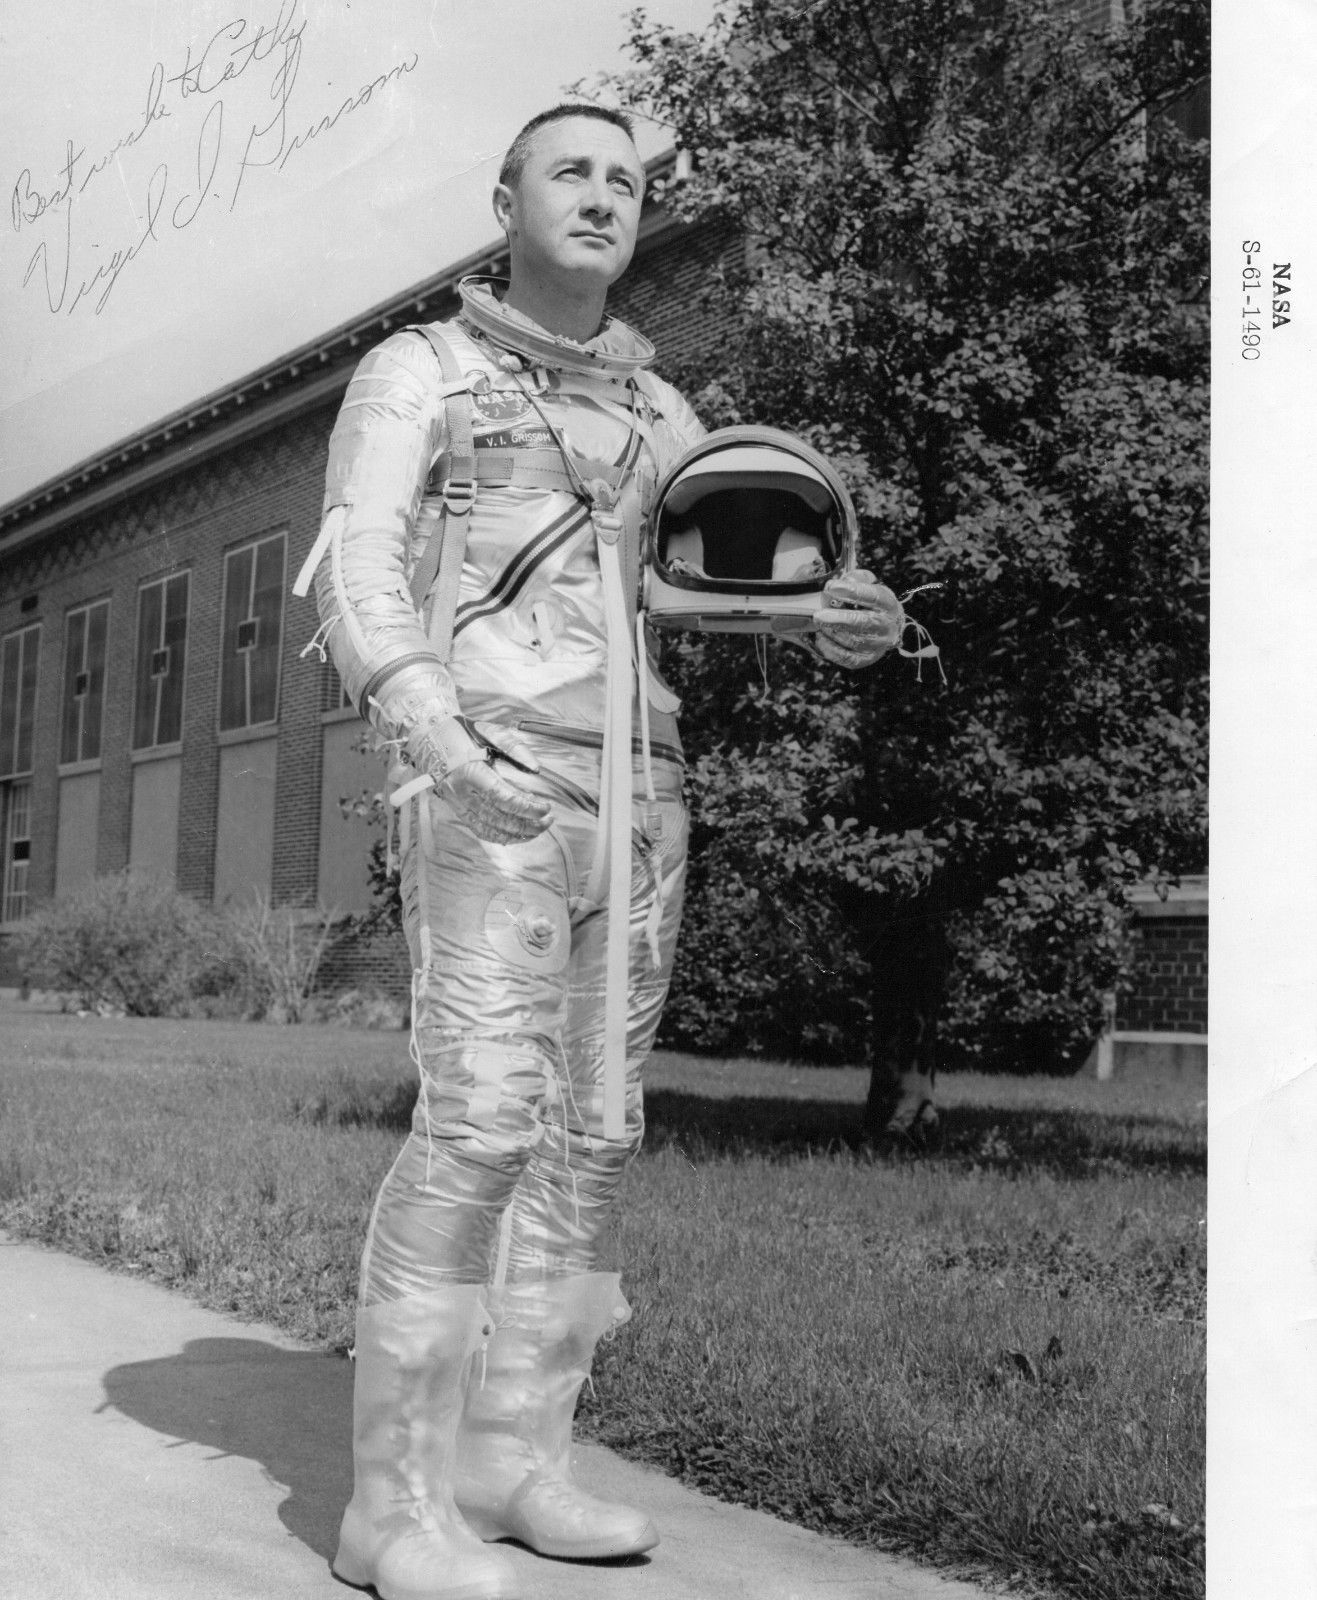 Unique Gus Grissom signed NASA photograph